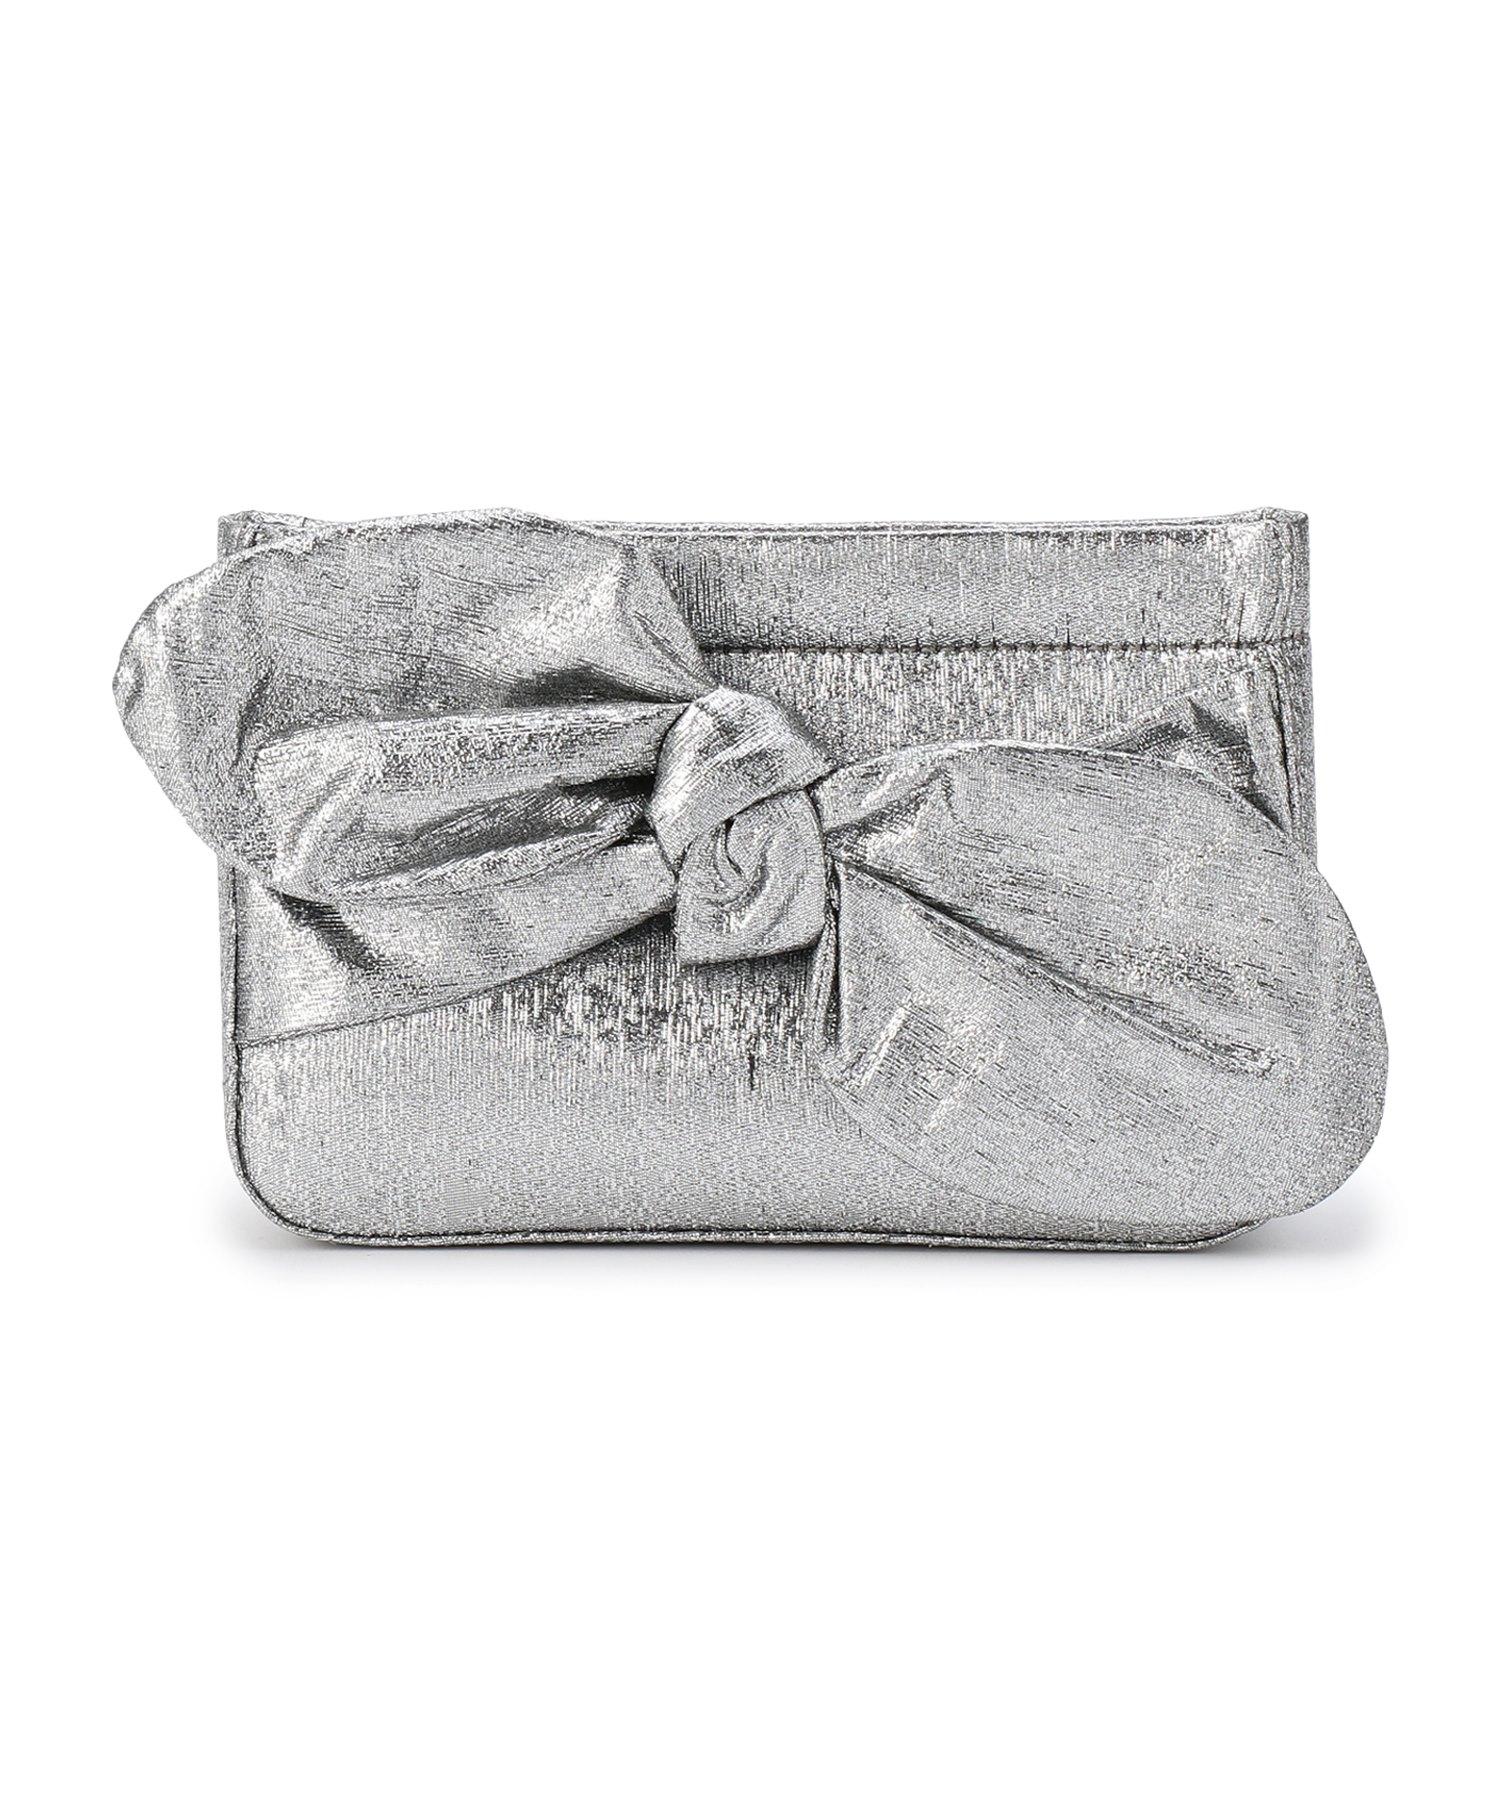 LOEFFLER RANDALL ショルダーストラップ付きバッグ